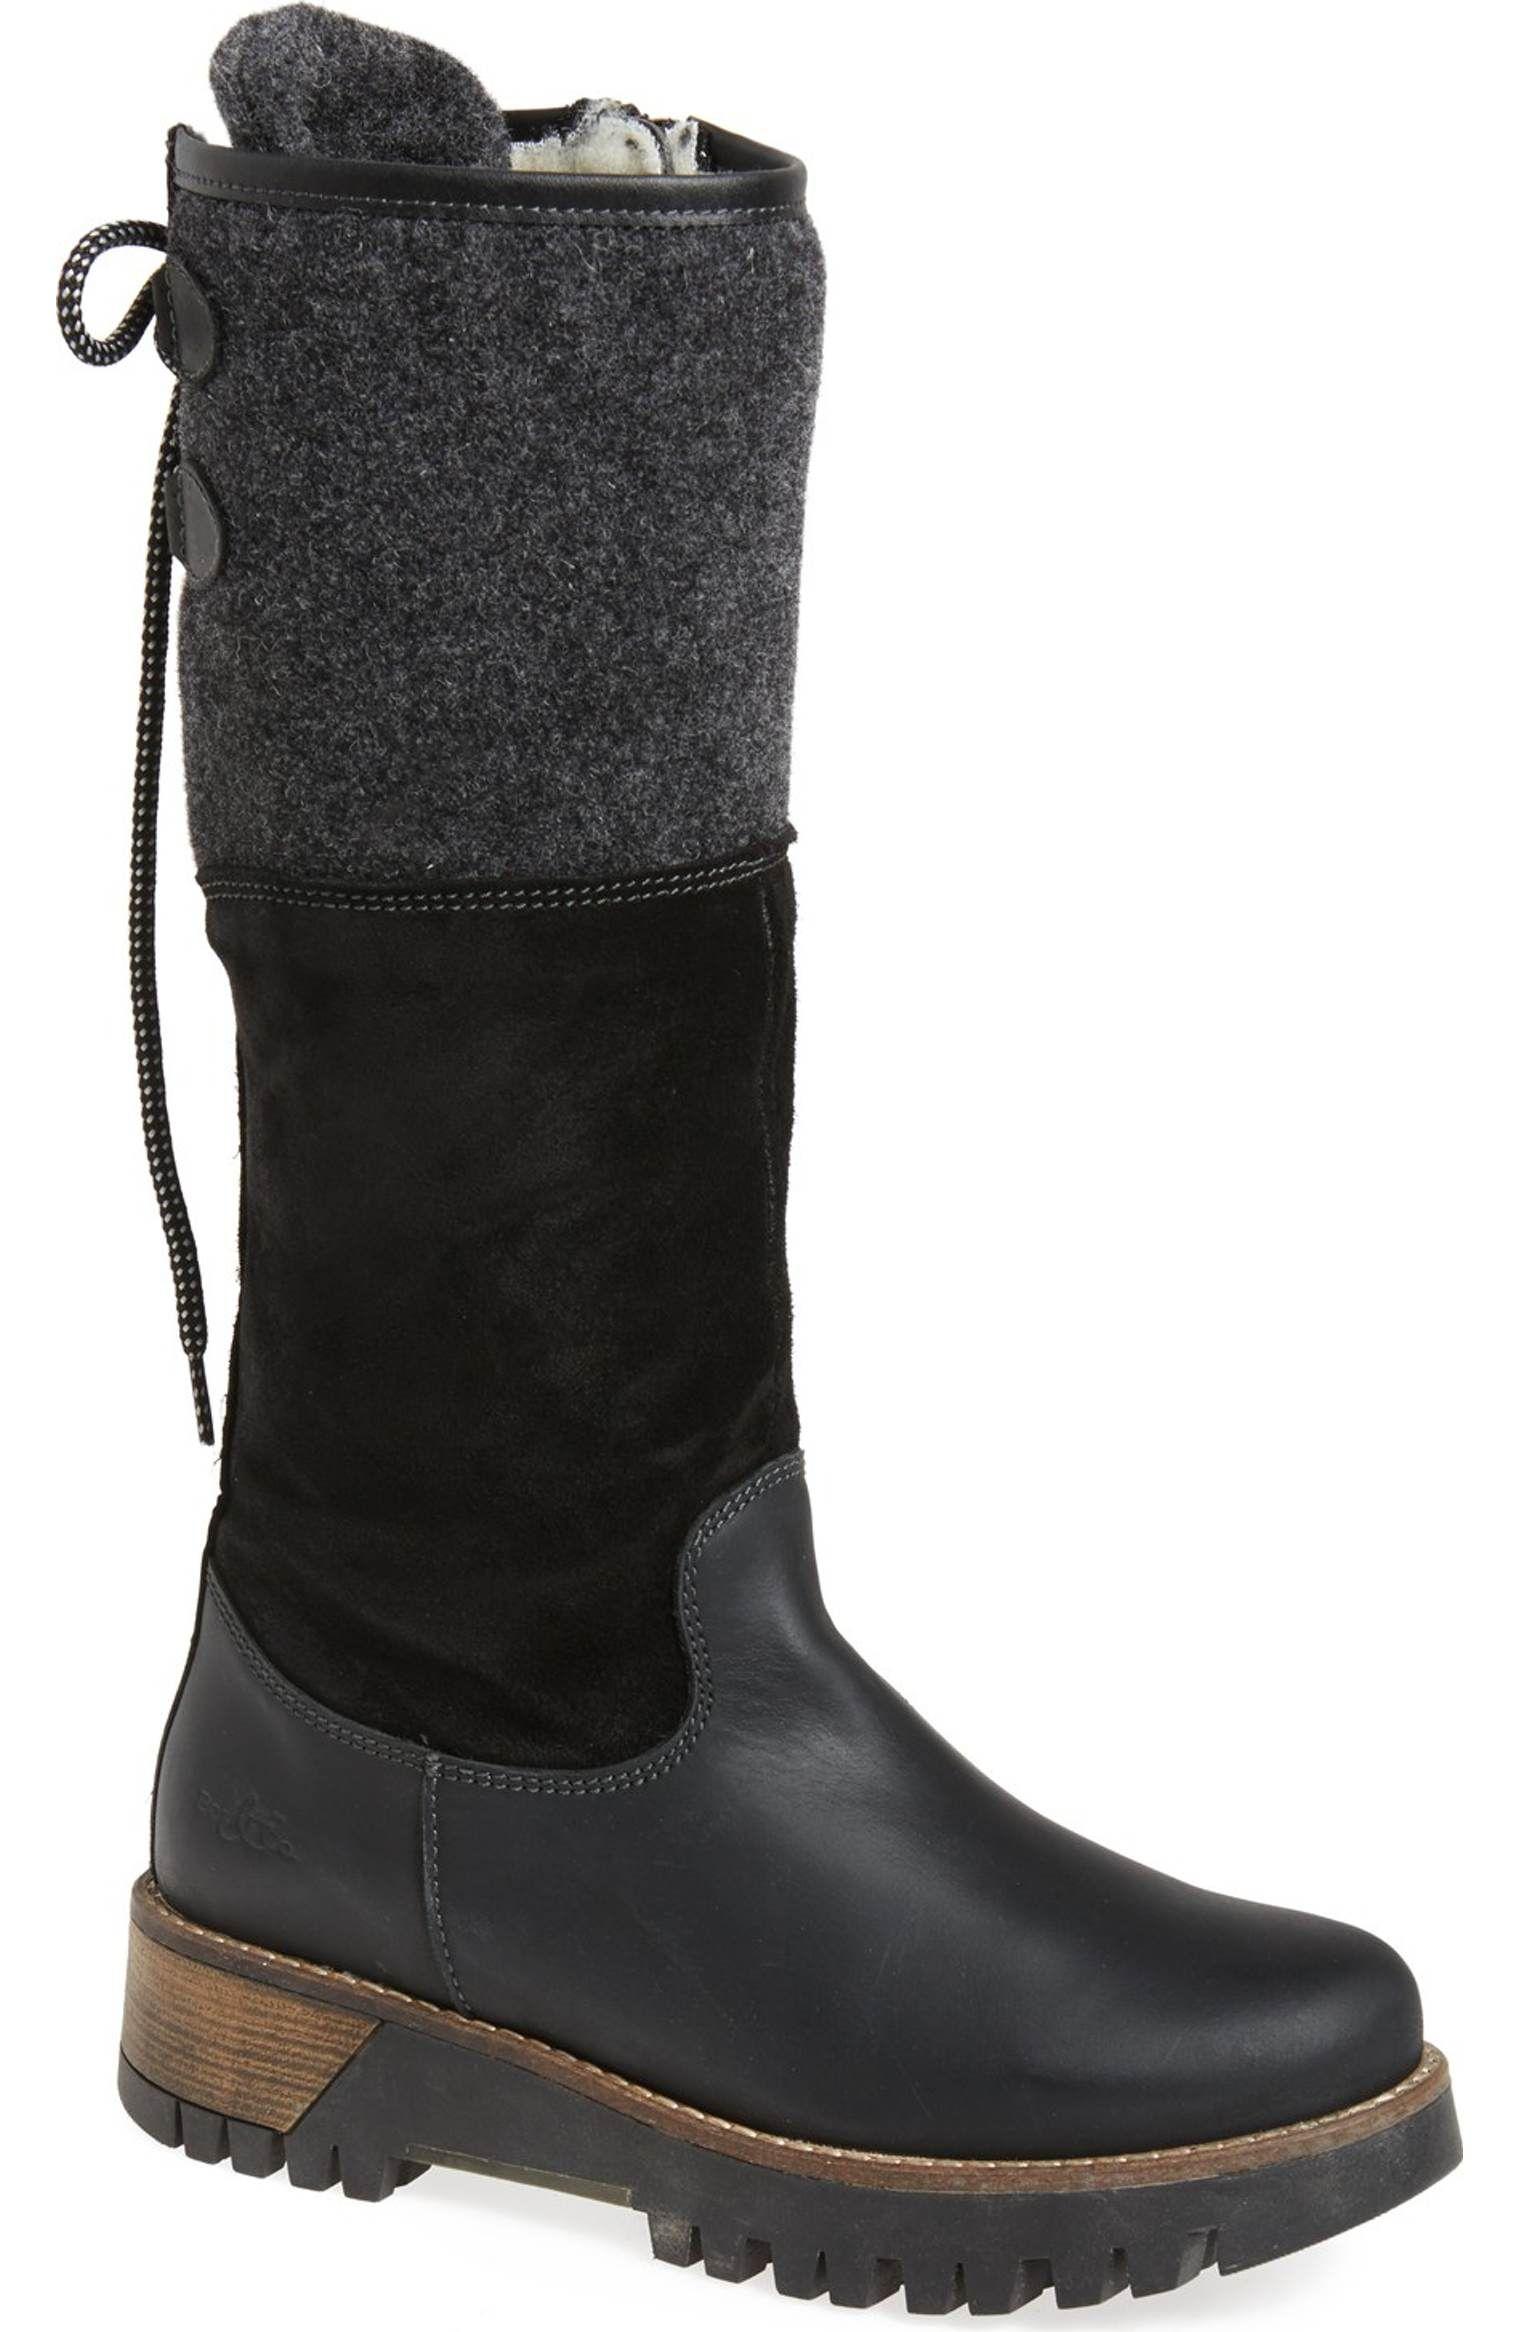 0d8adf96c47 Main Image - Bos.   Co.  Ginger  Waterproof Mid Calf Platform Boot ...